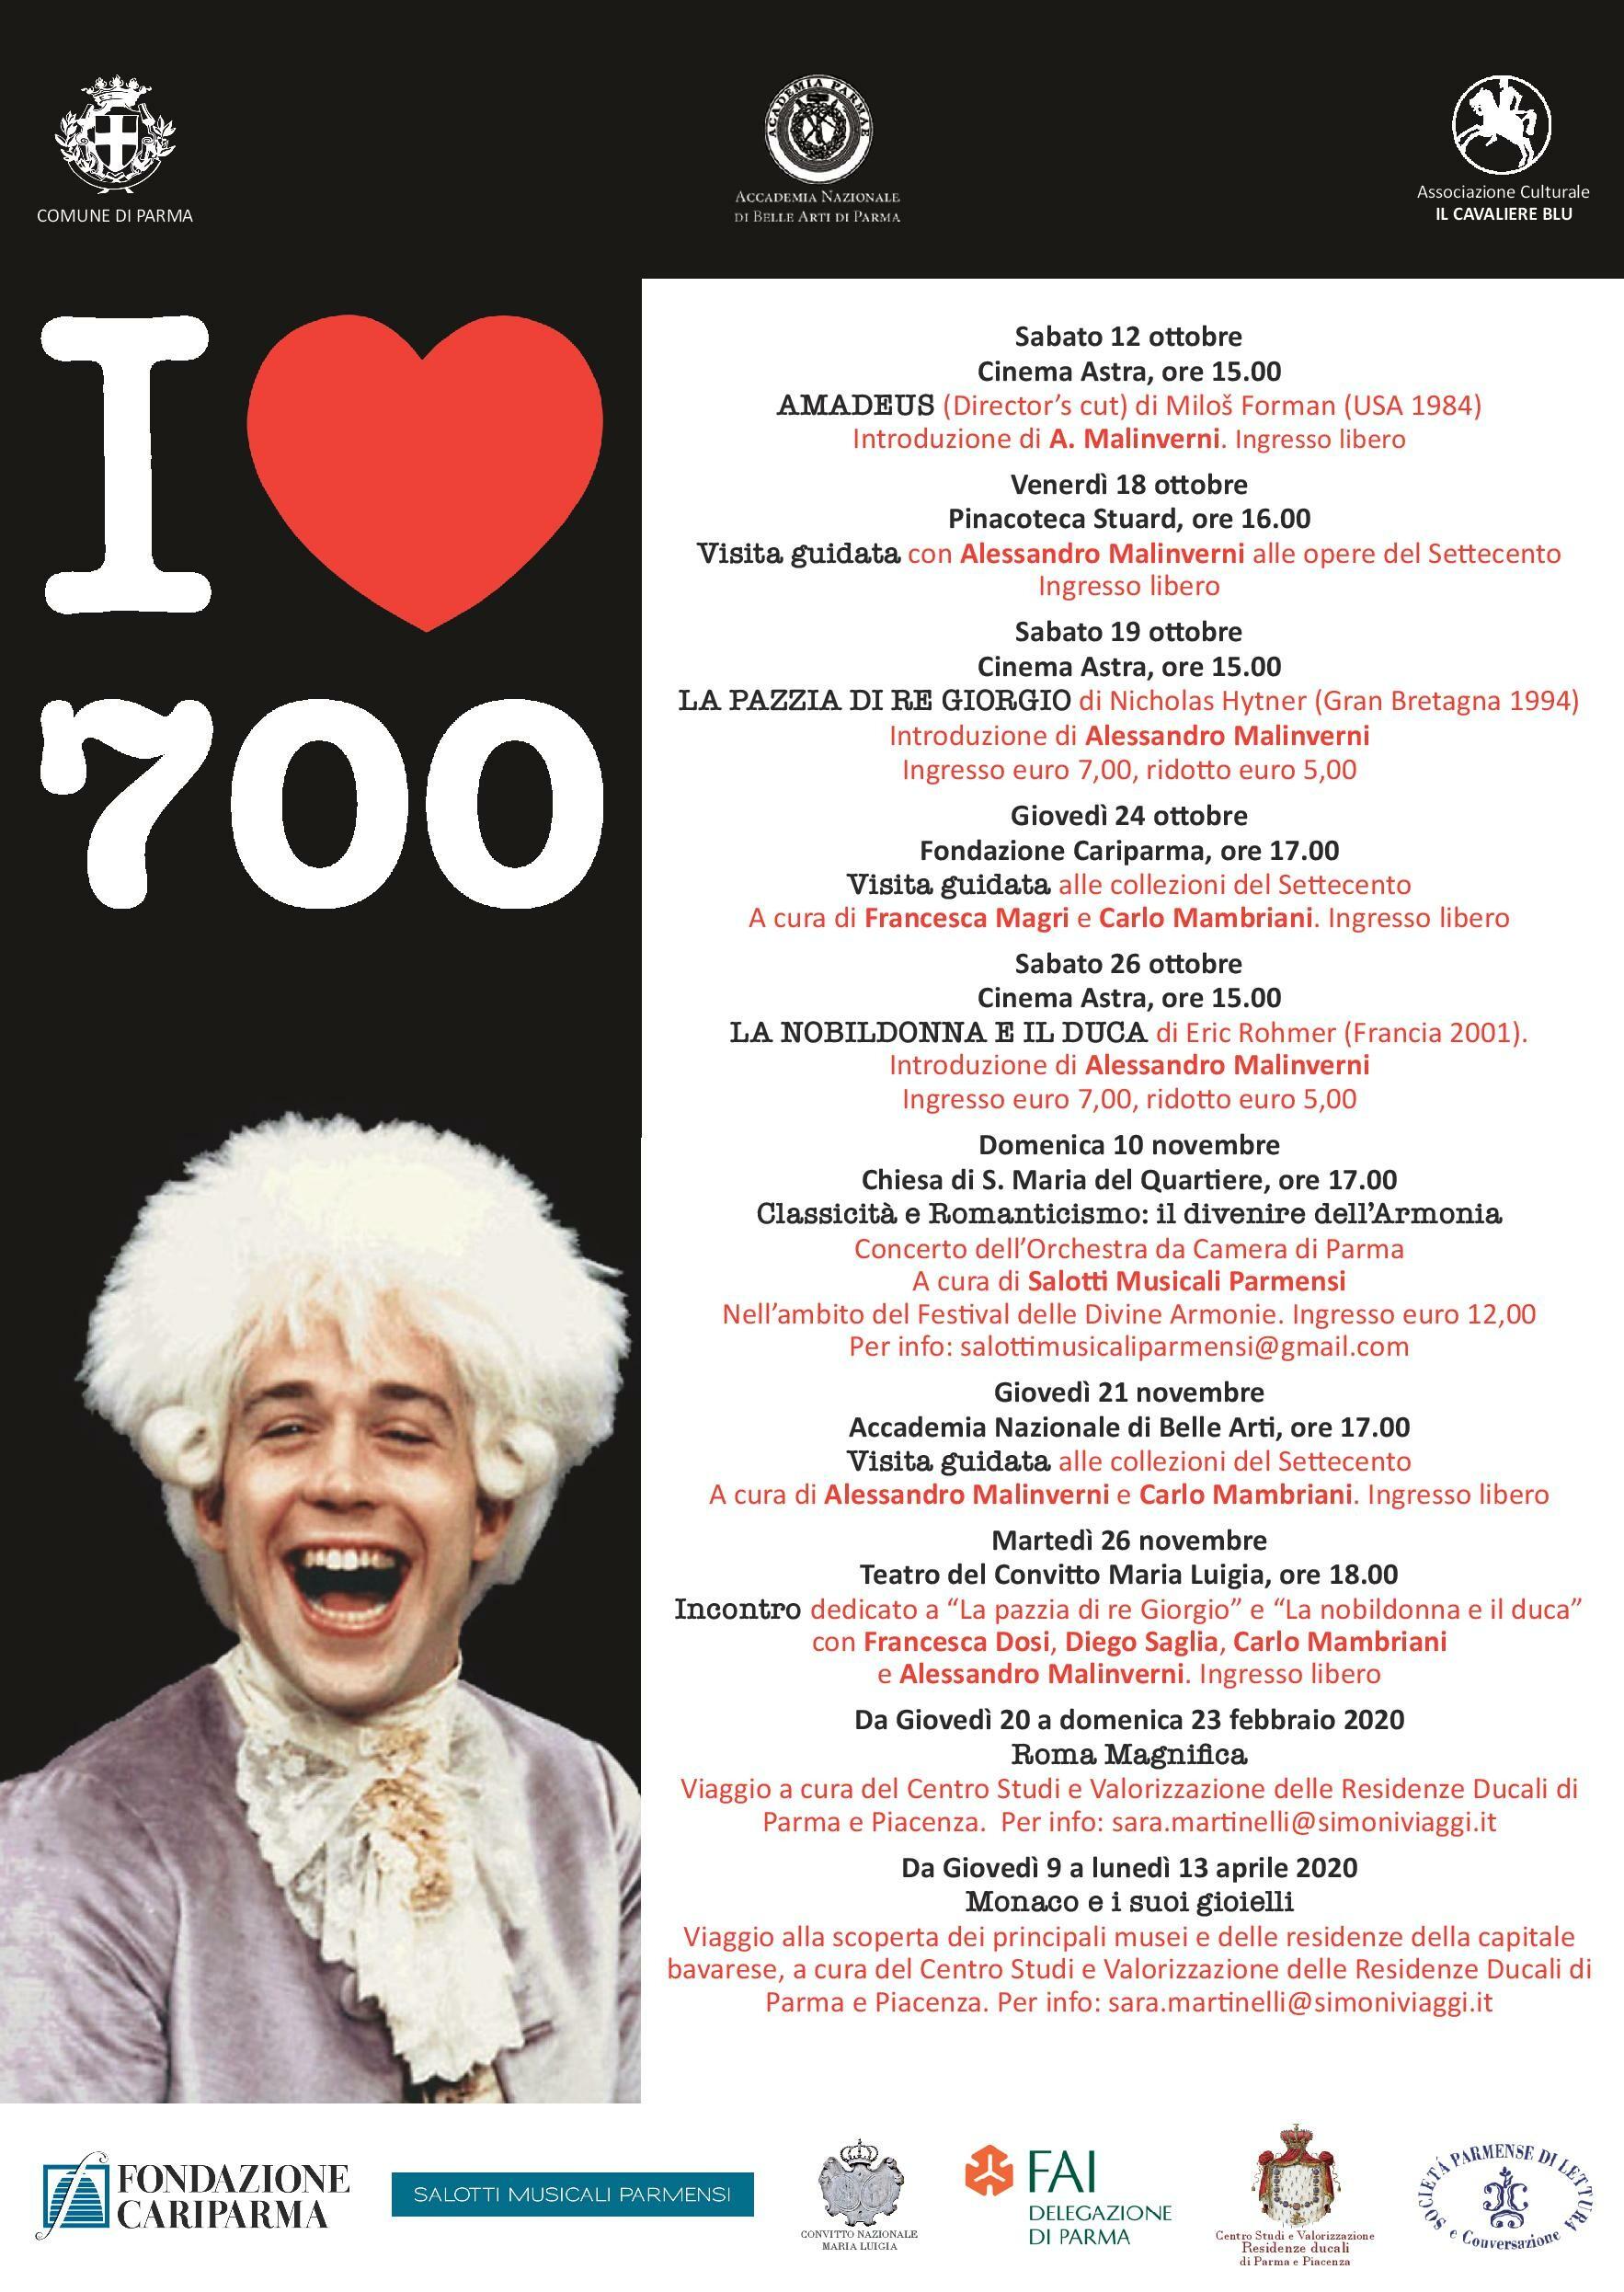 I love 700 al  Cinema Astra